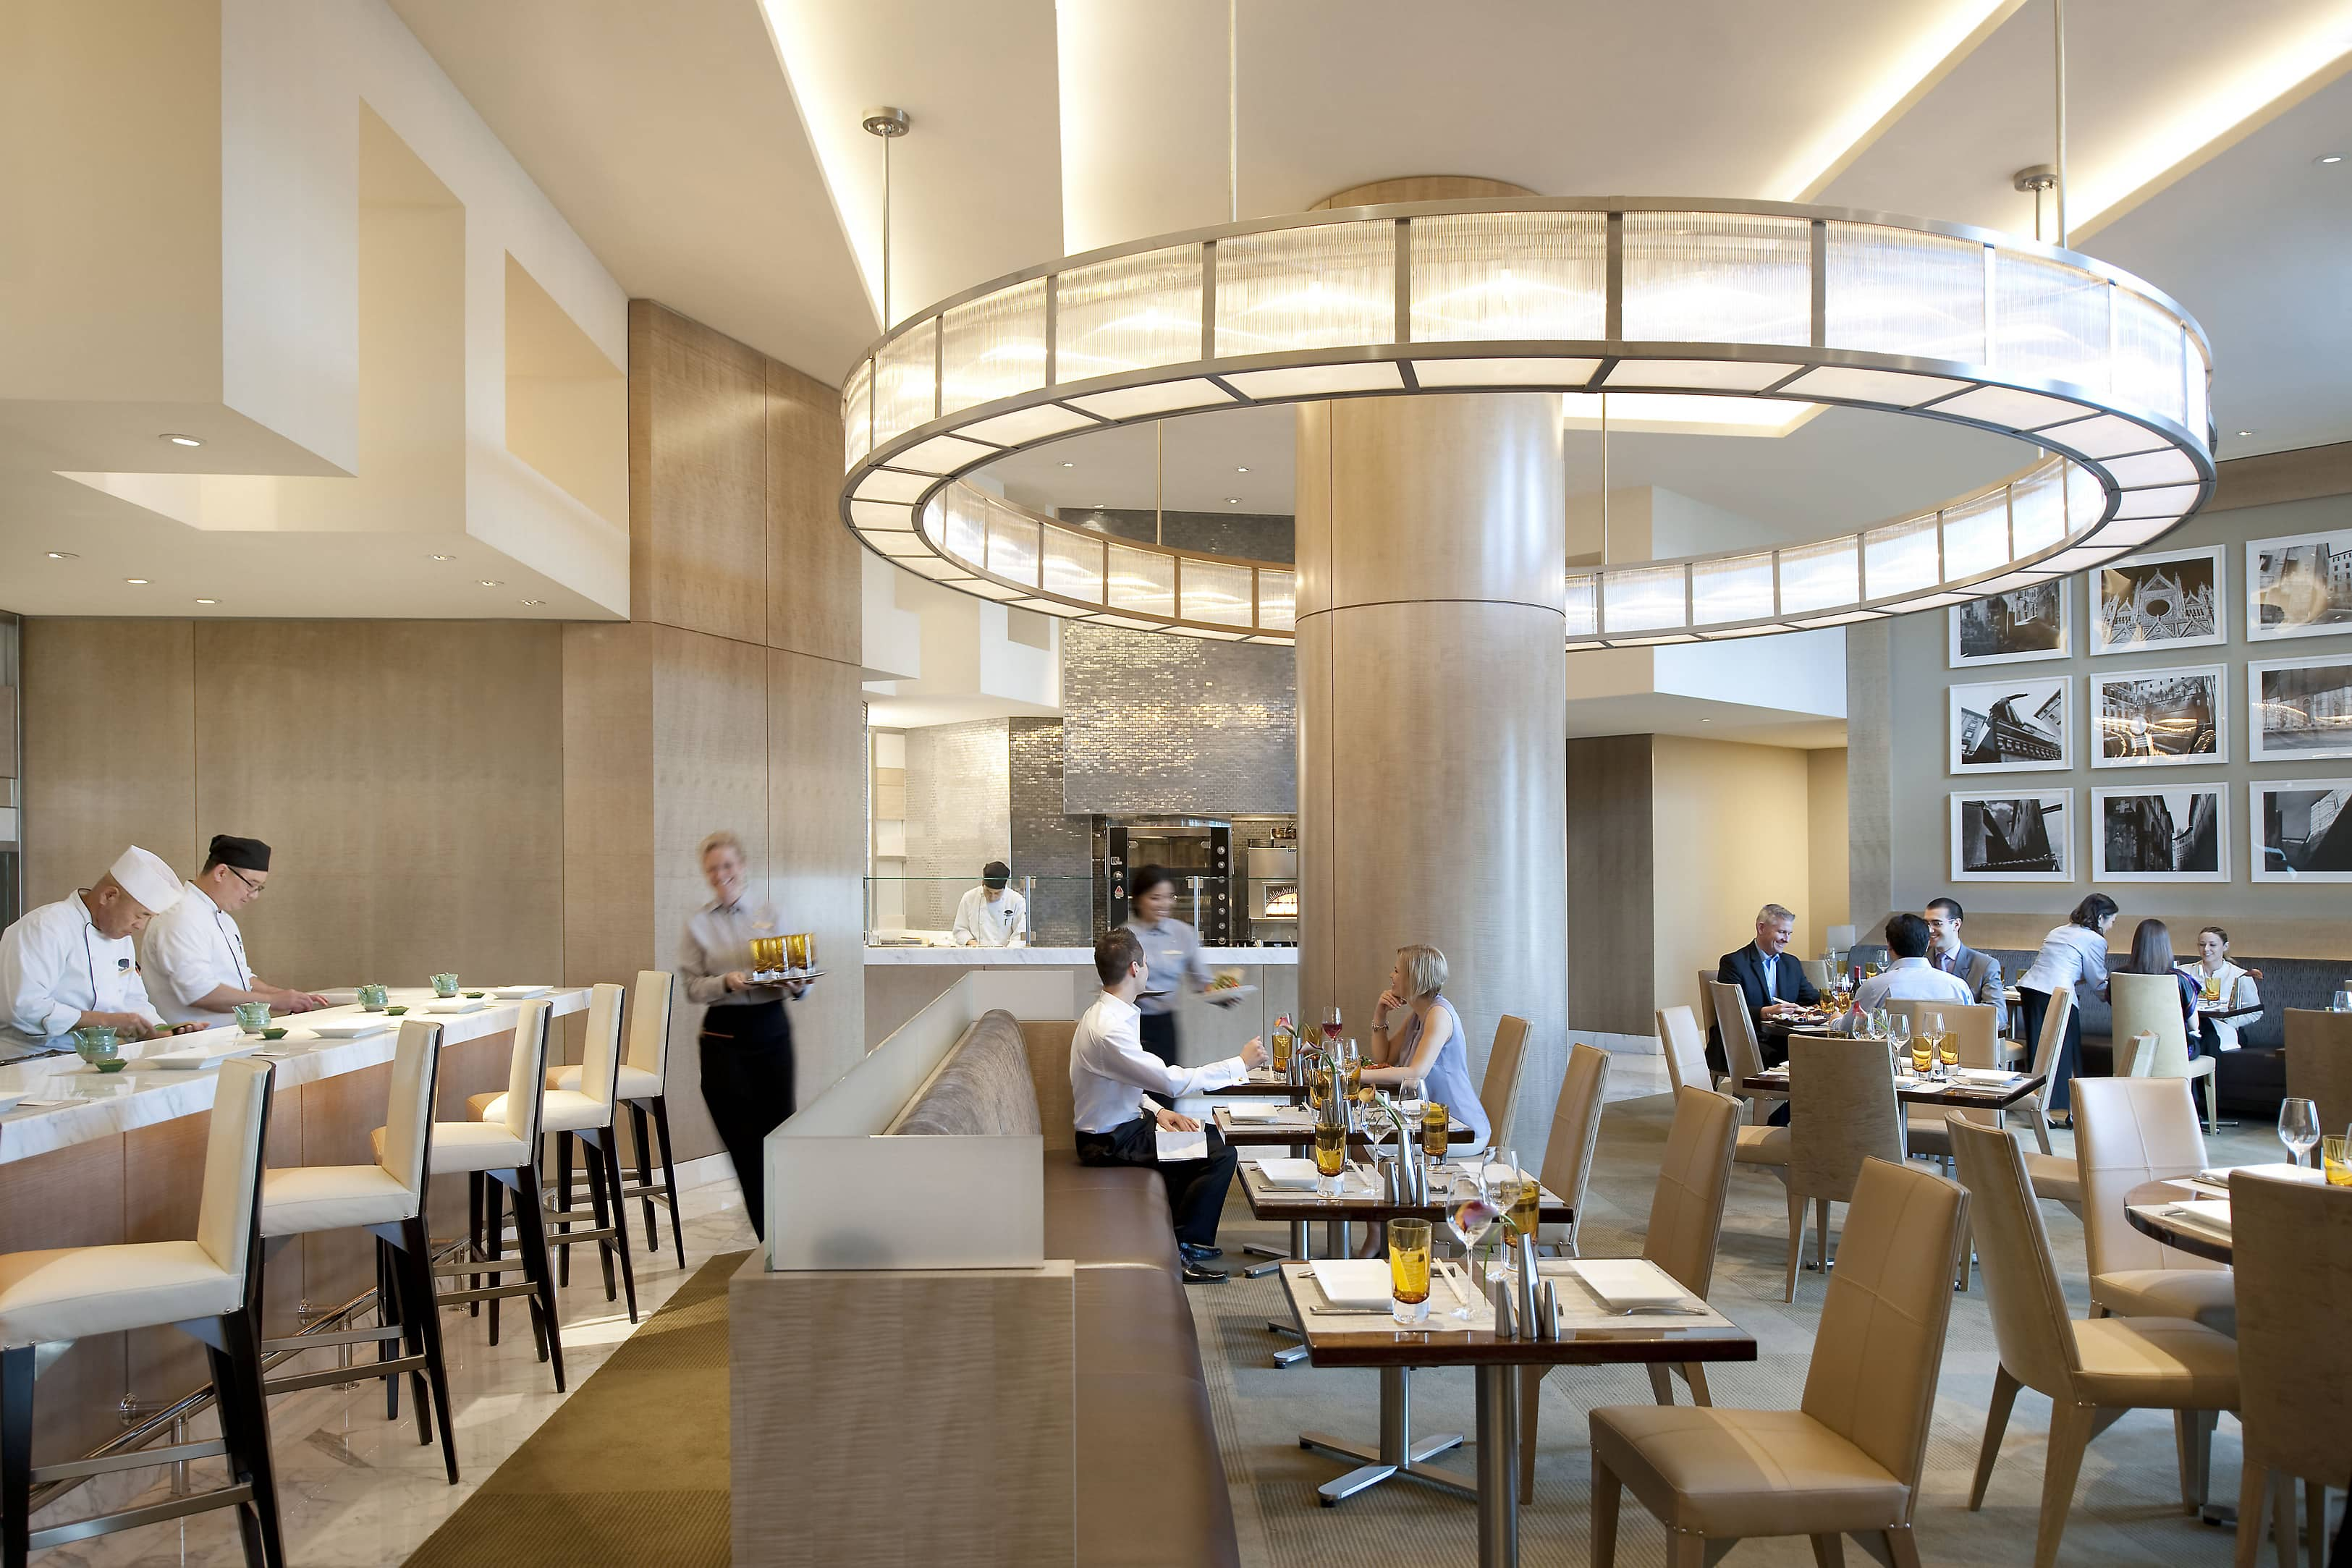 Las vegas hotel fotogalerie mandarin oriental hotel las vegas - Hotel mandarin restaurante ...